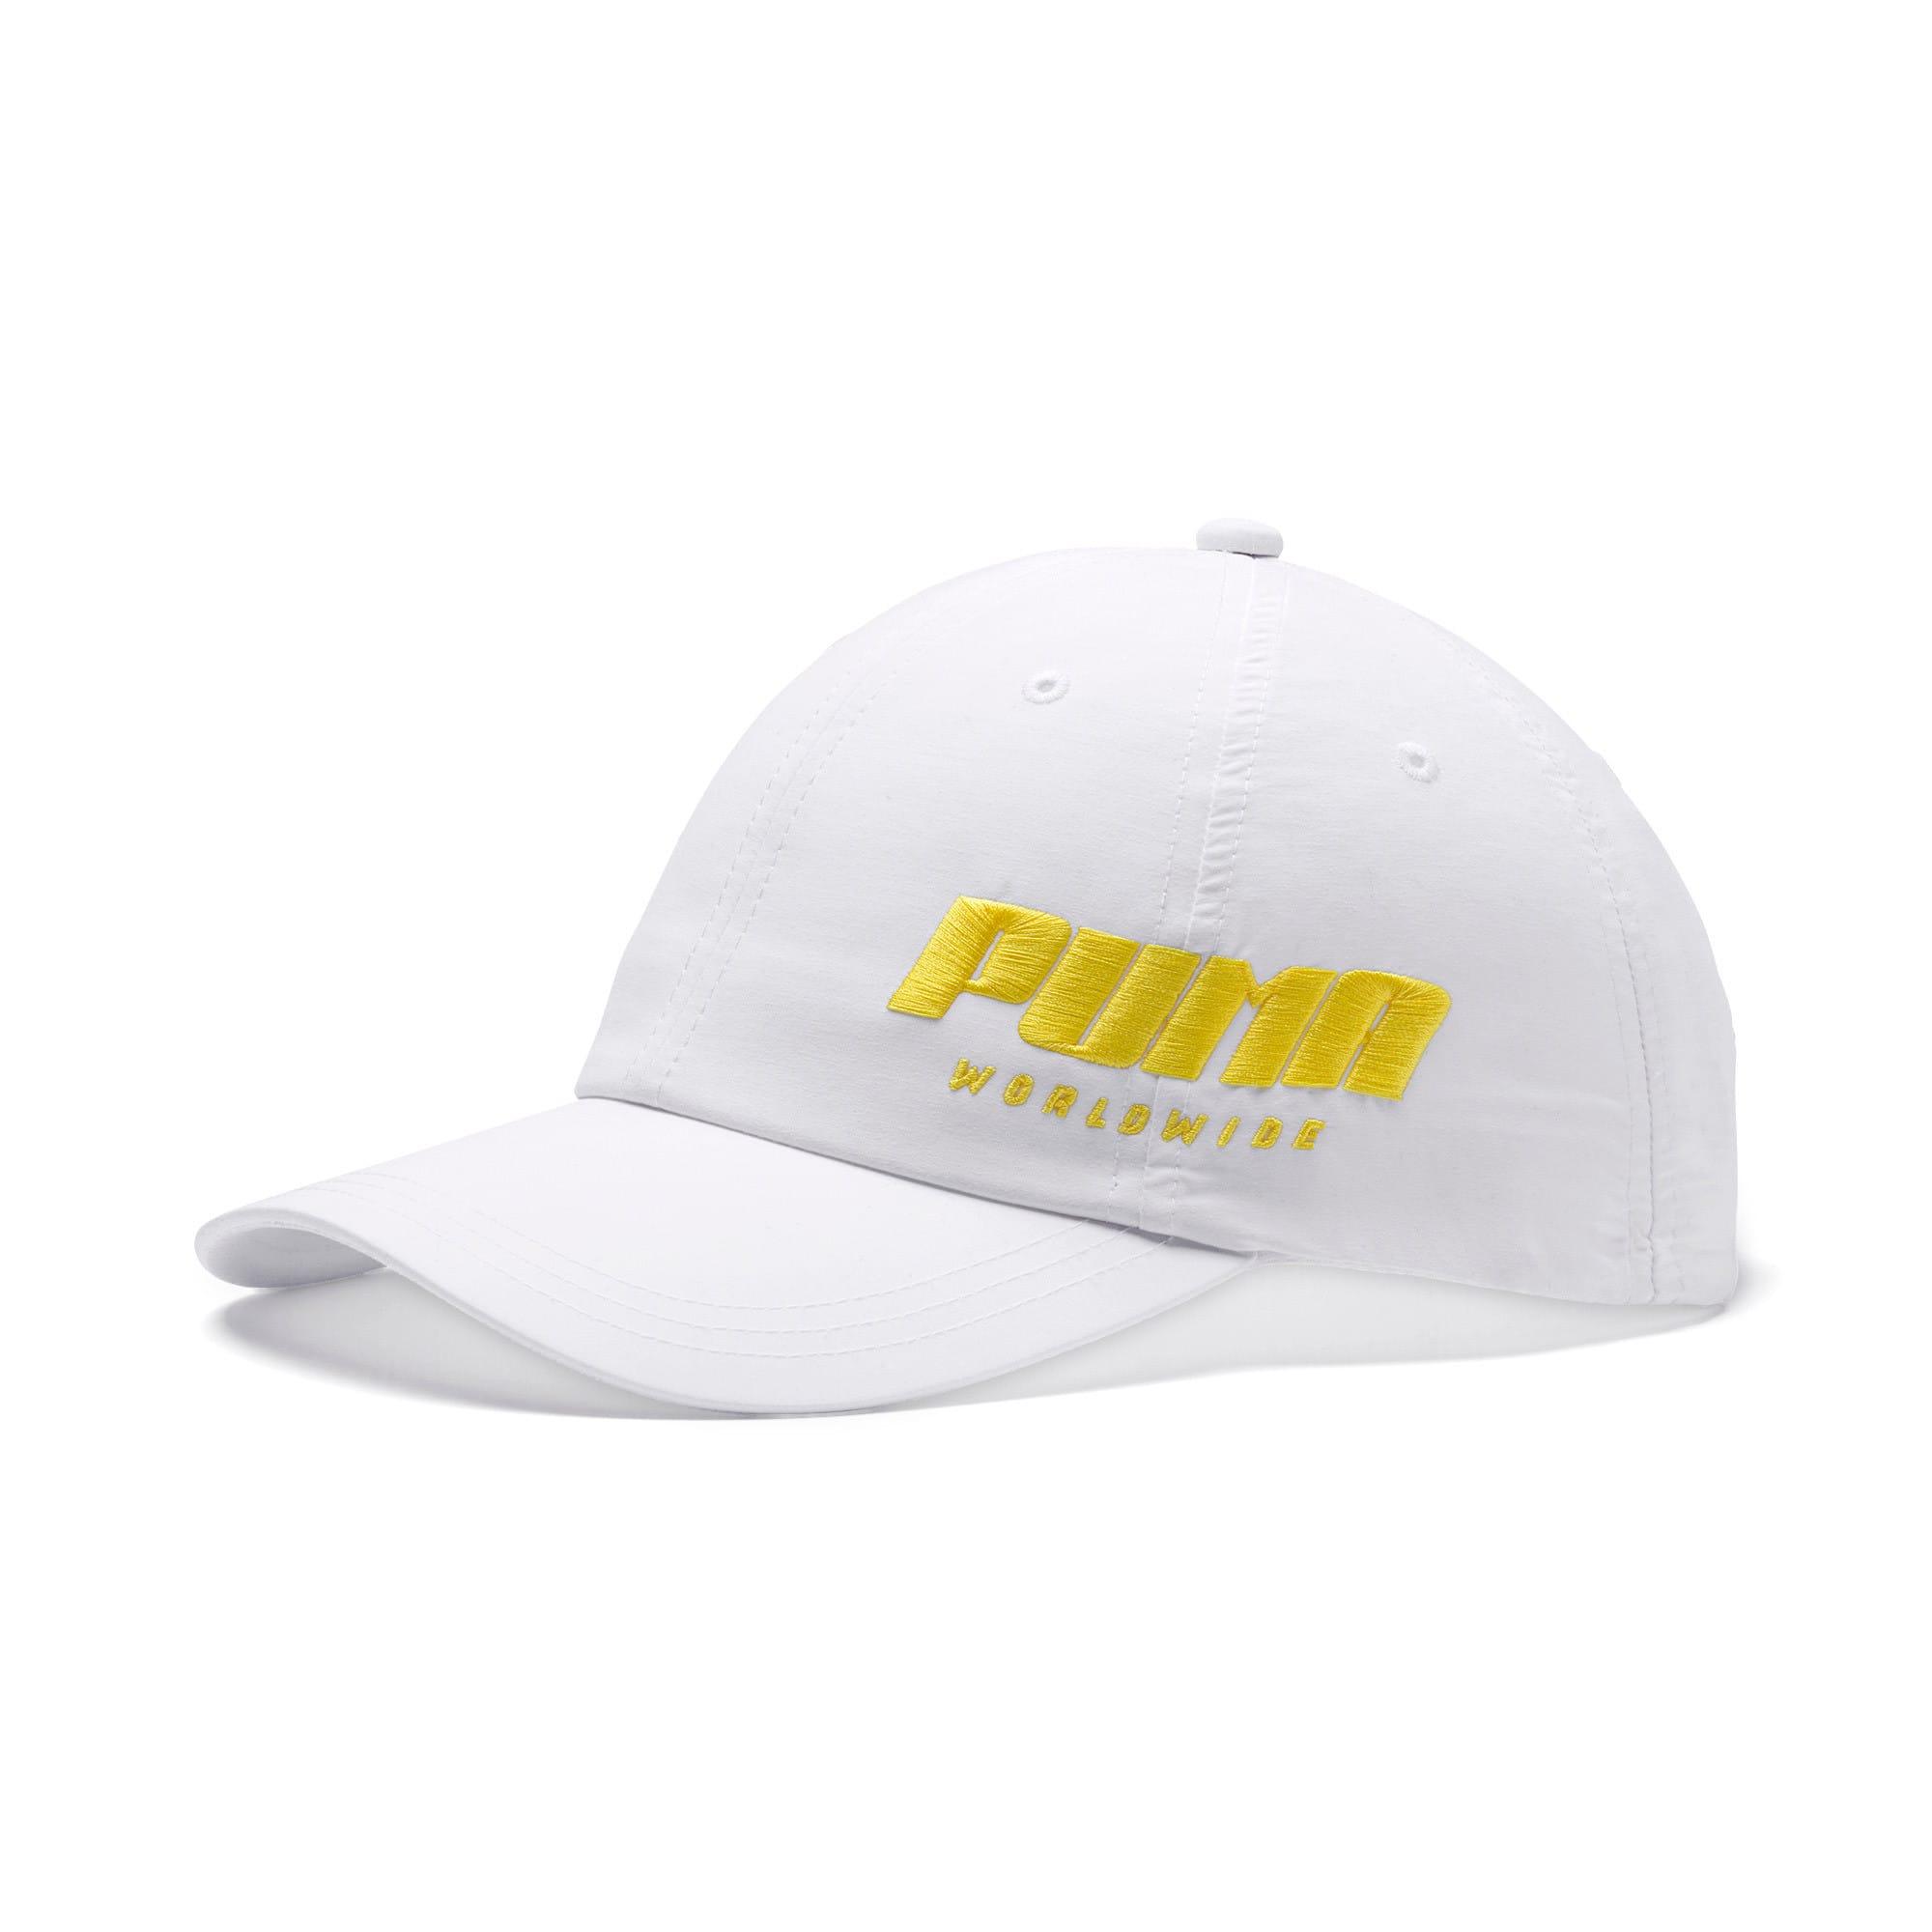 Thumbnail 1 of Trailblazer Cap, Puma White-Blazing Yellow, medium